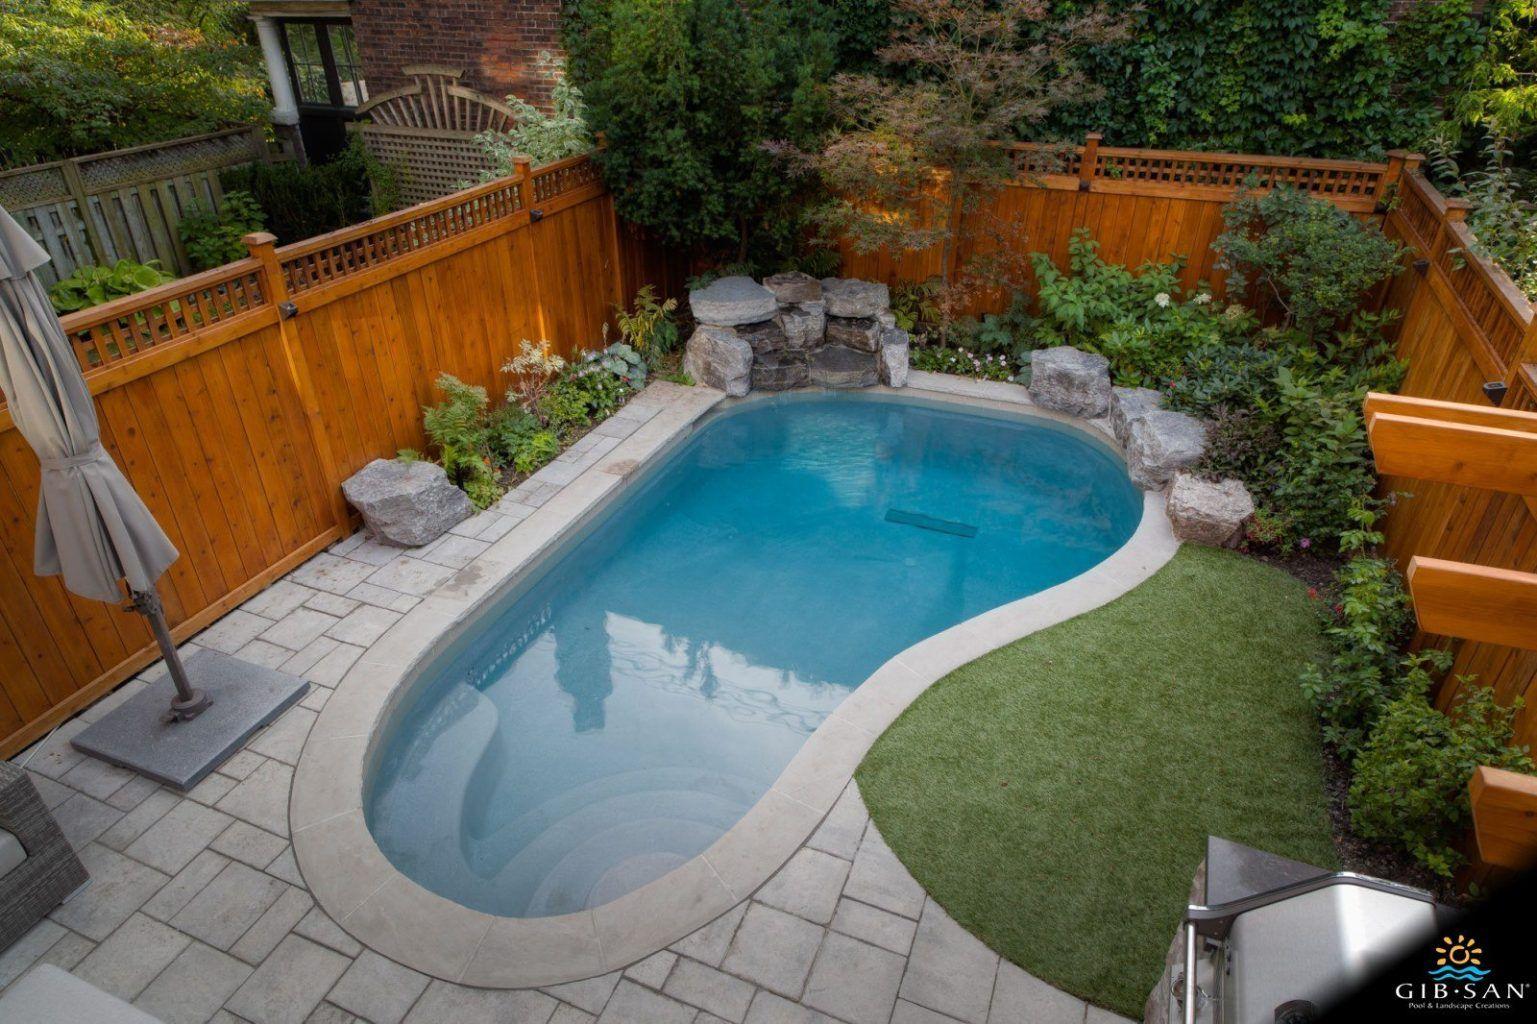 S Pools Swim Spas Gib San Pools Toronto Mississauga Oakville Swim Spa Small Pool Design Cool Swimming Pools